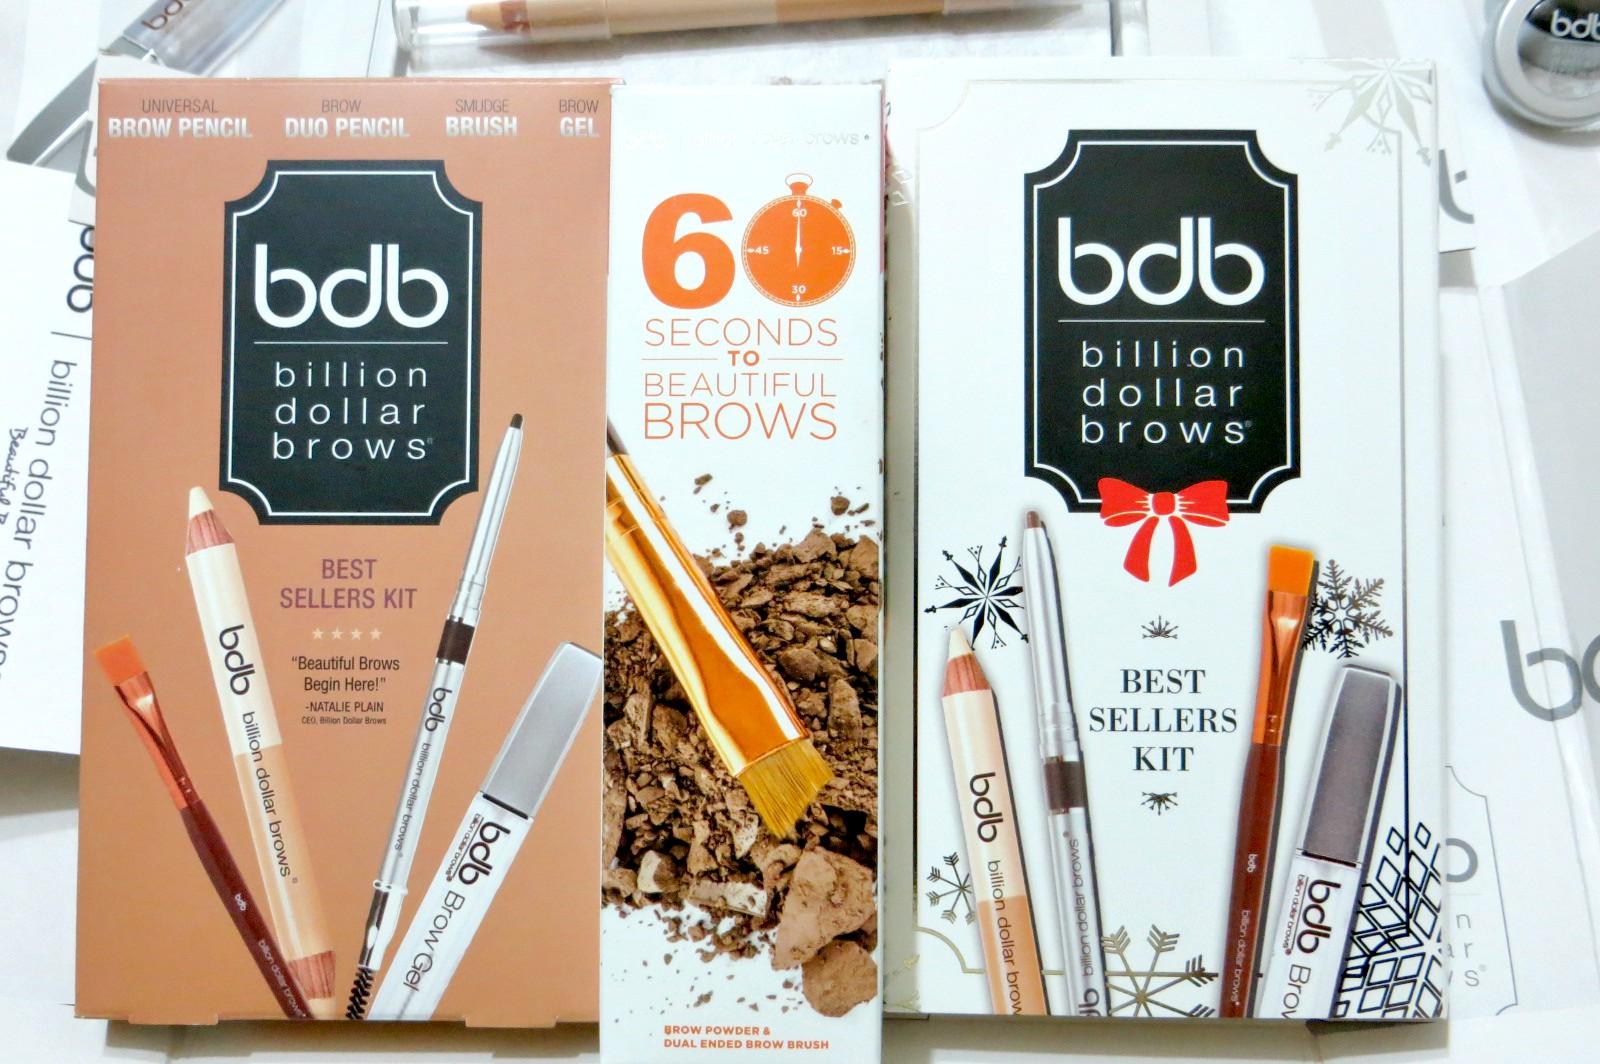 Billion Dollar Brows - The Beginning of Beautiful Brows! #bdbrows ...